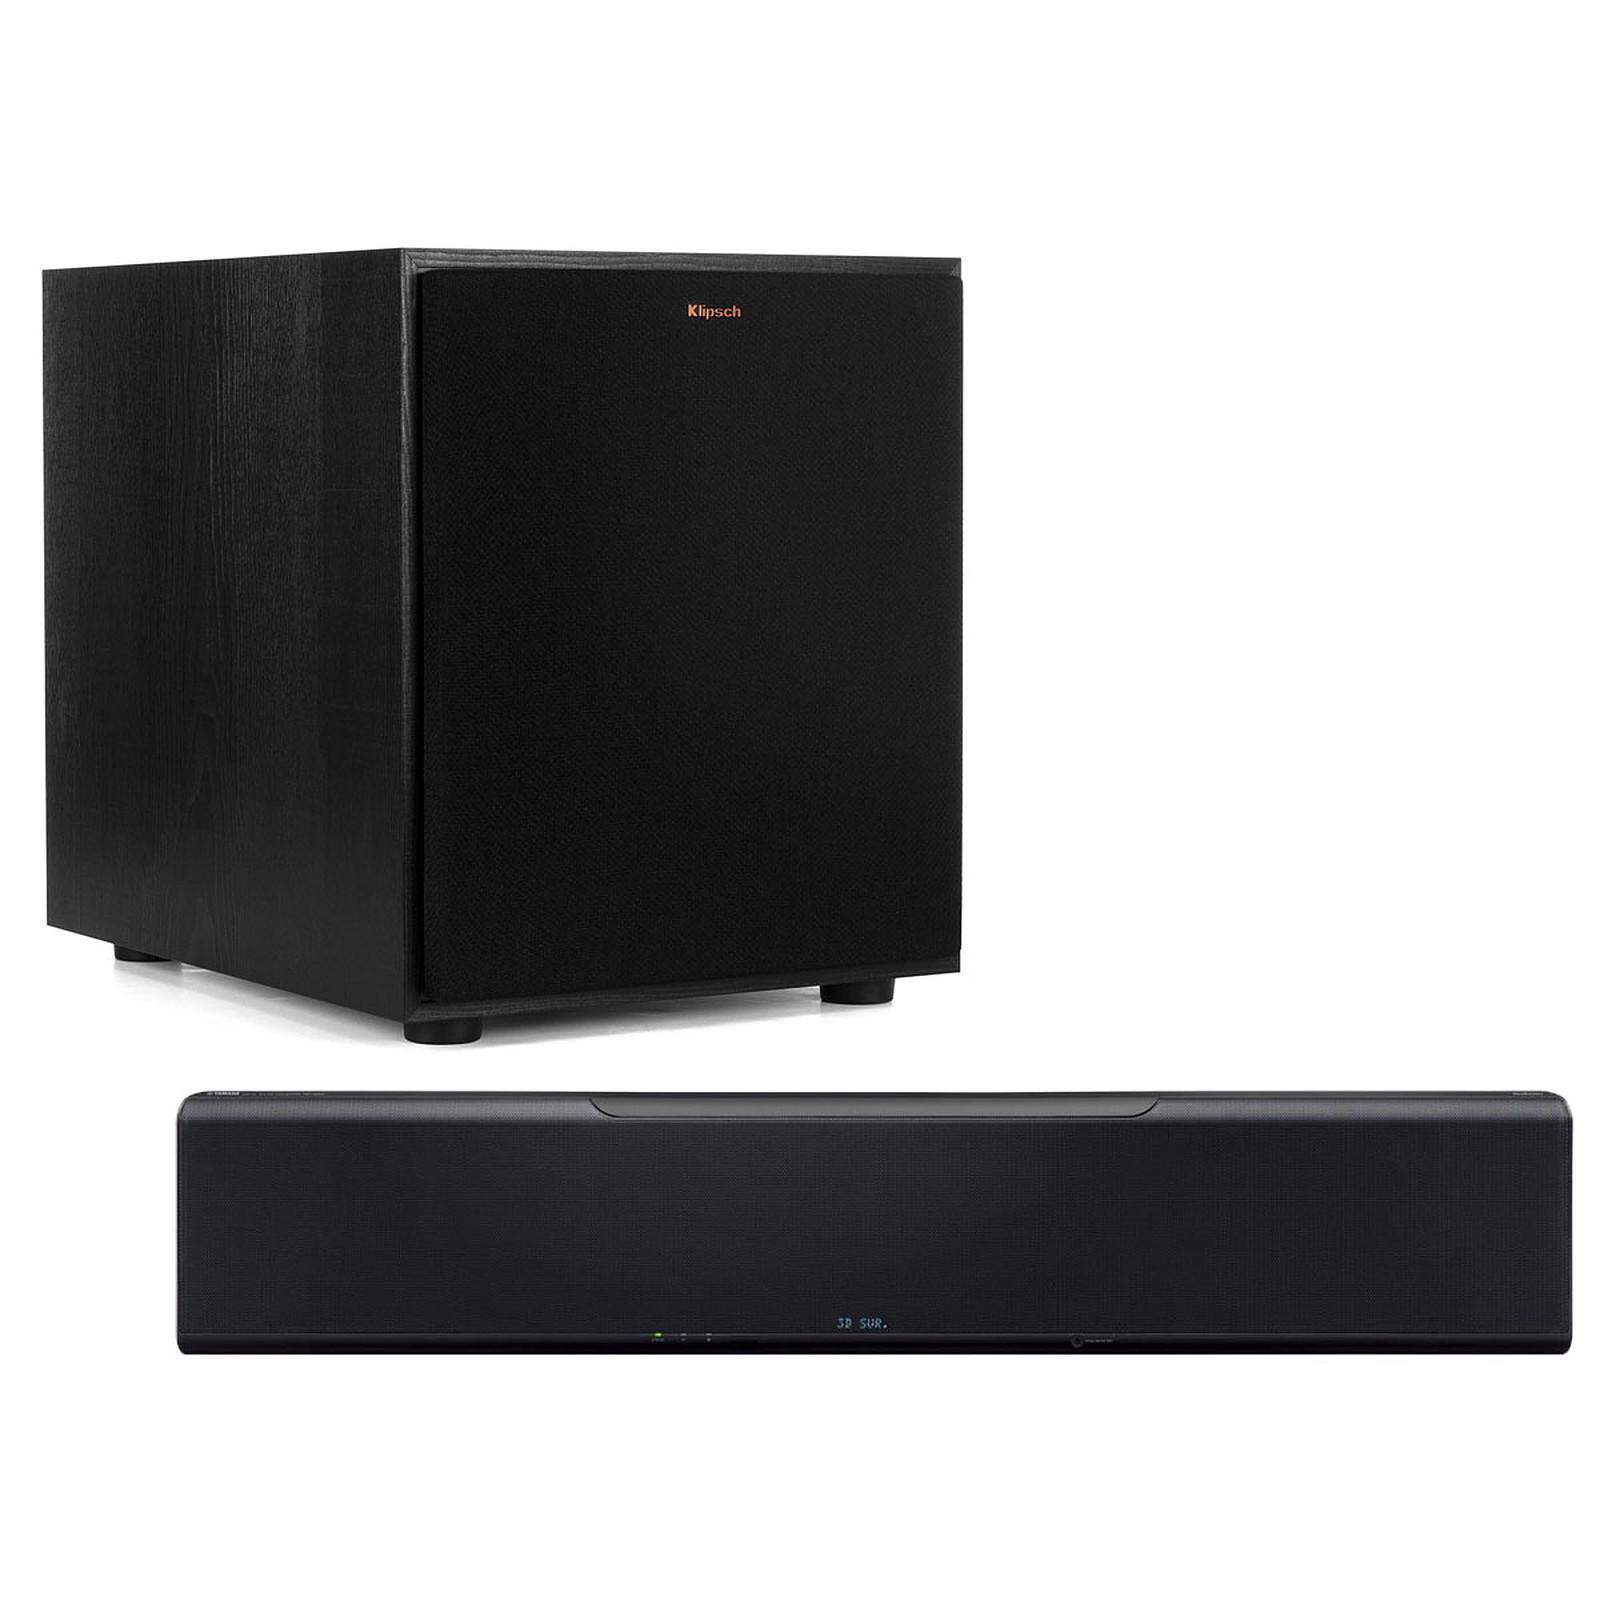 Yamaha MusicCast YSP-5600 + Klipsch R-120SW